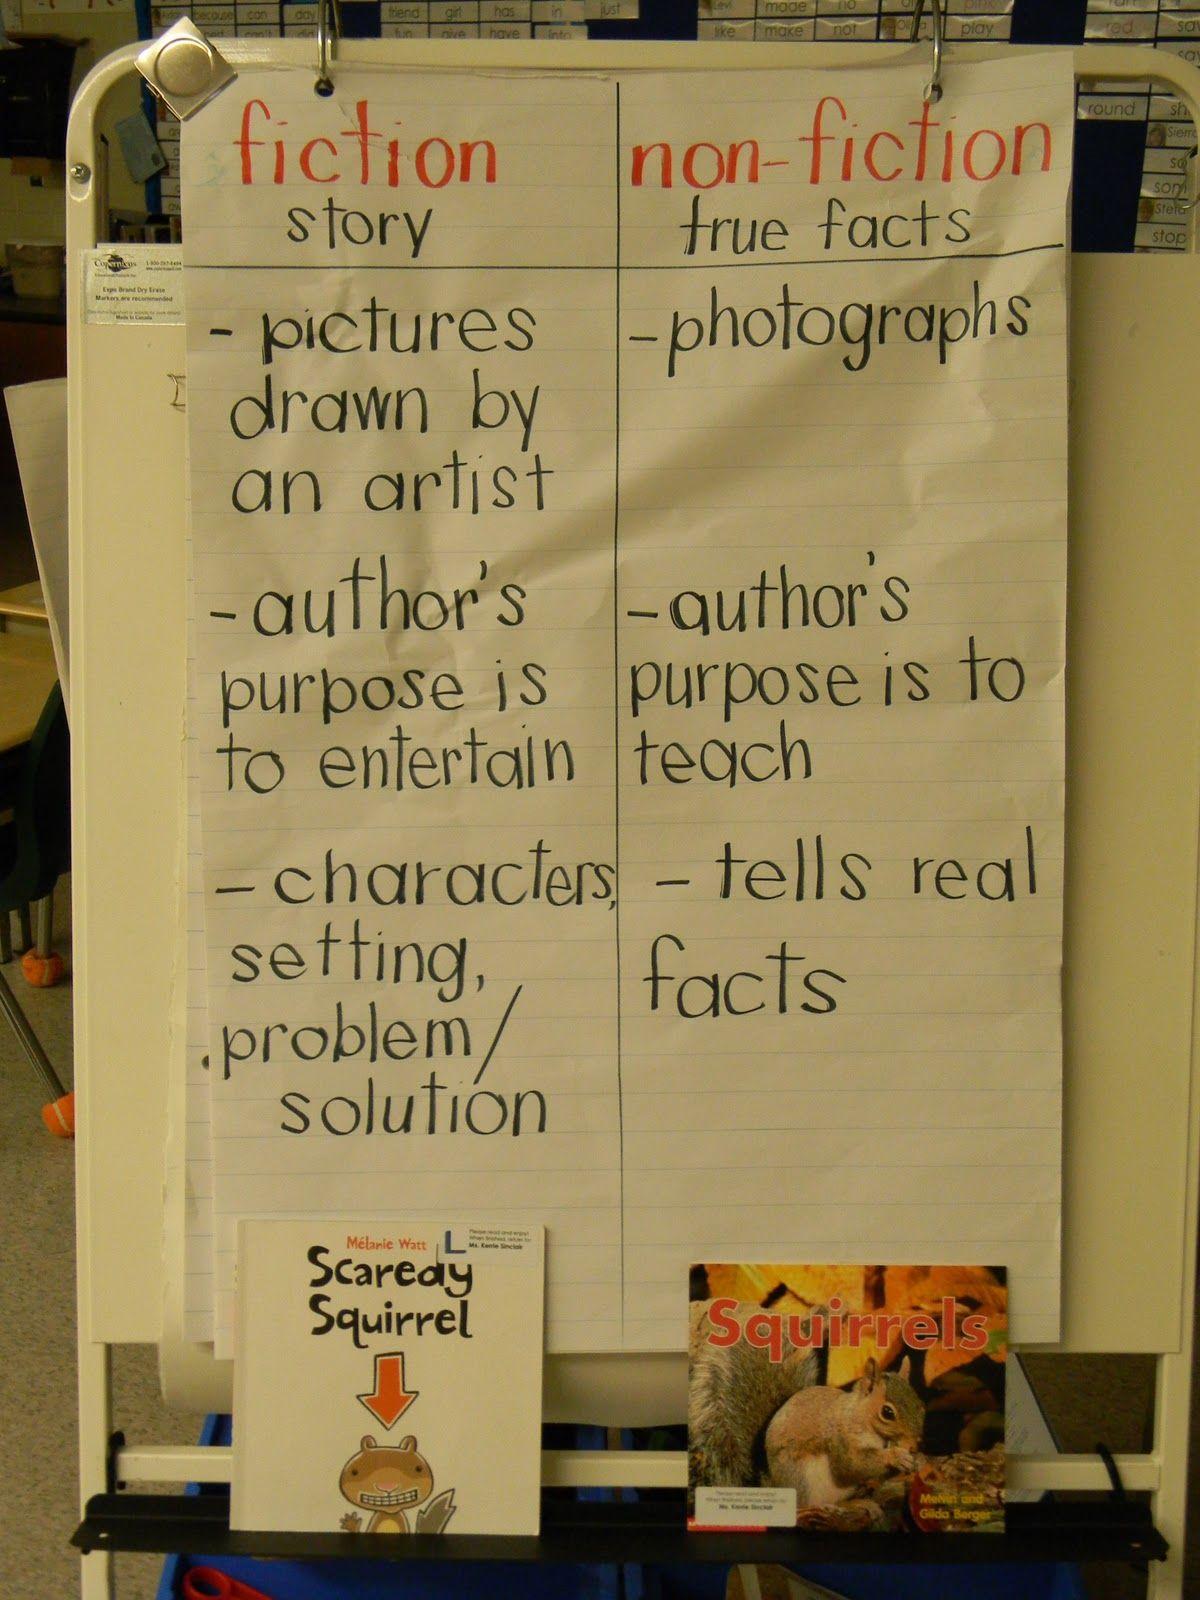 Venn Diagram On Fiction Vs Nonfiction